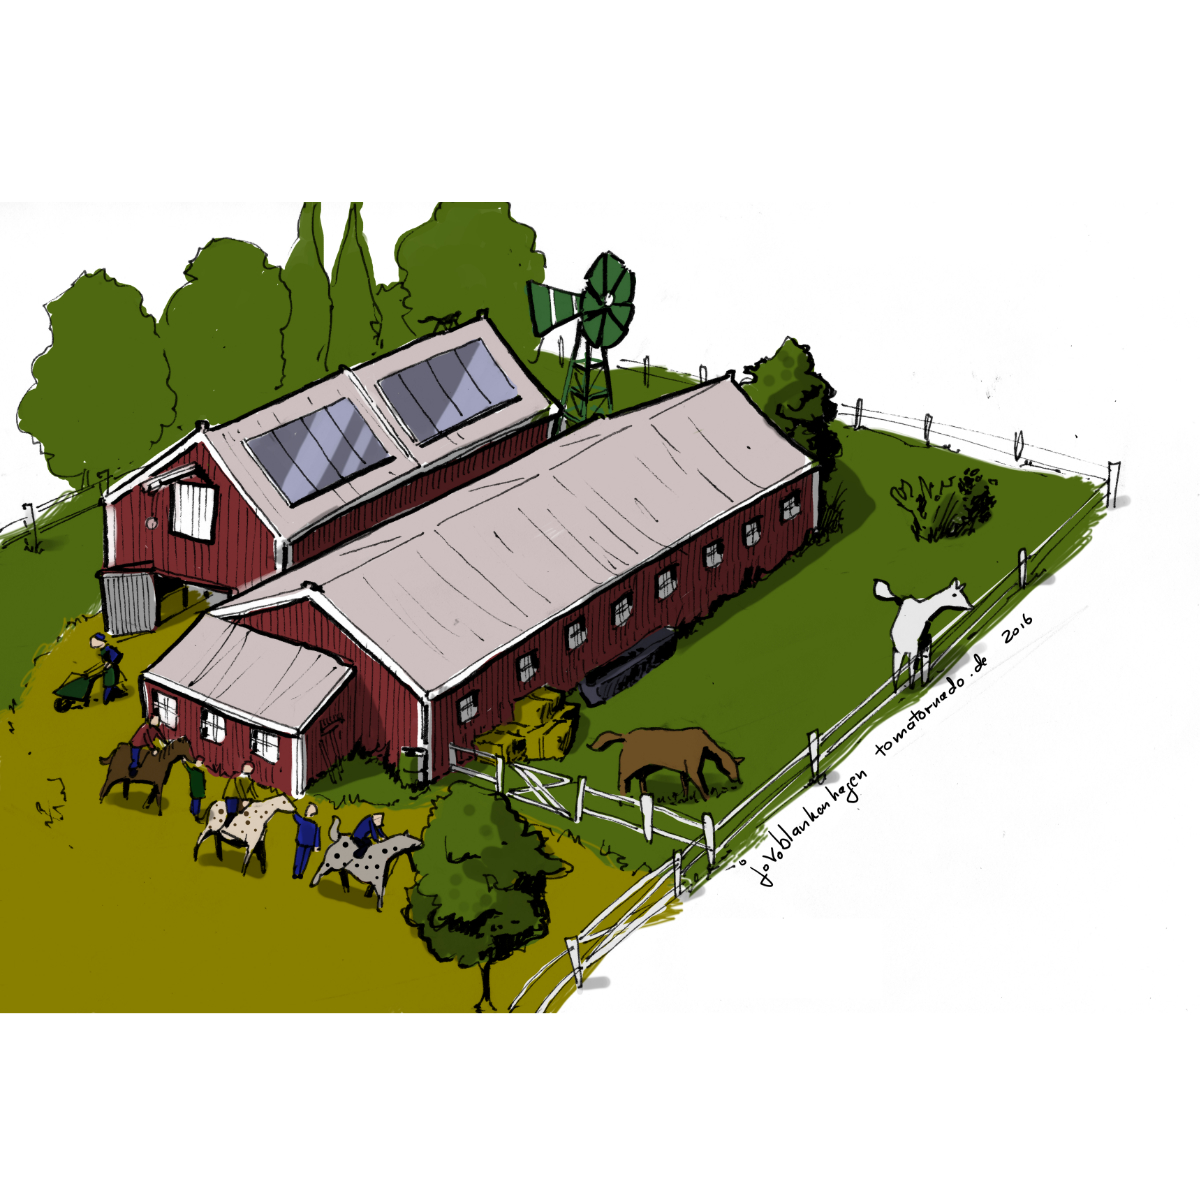 07-architecture-visual-farm-horses-autzeit.jpg